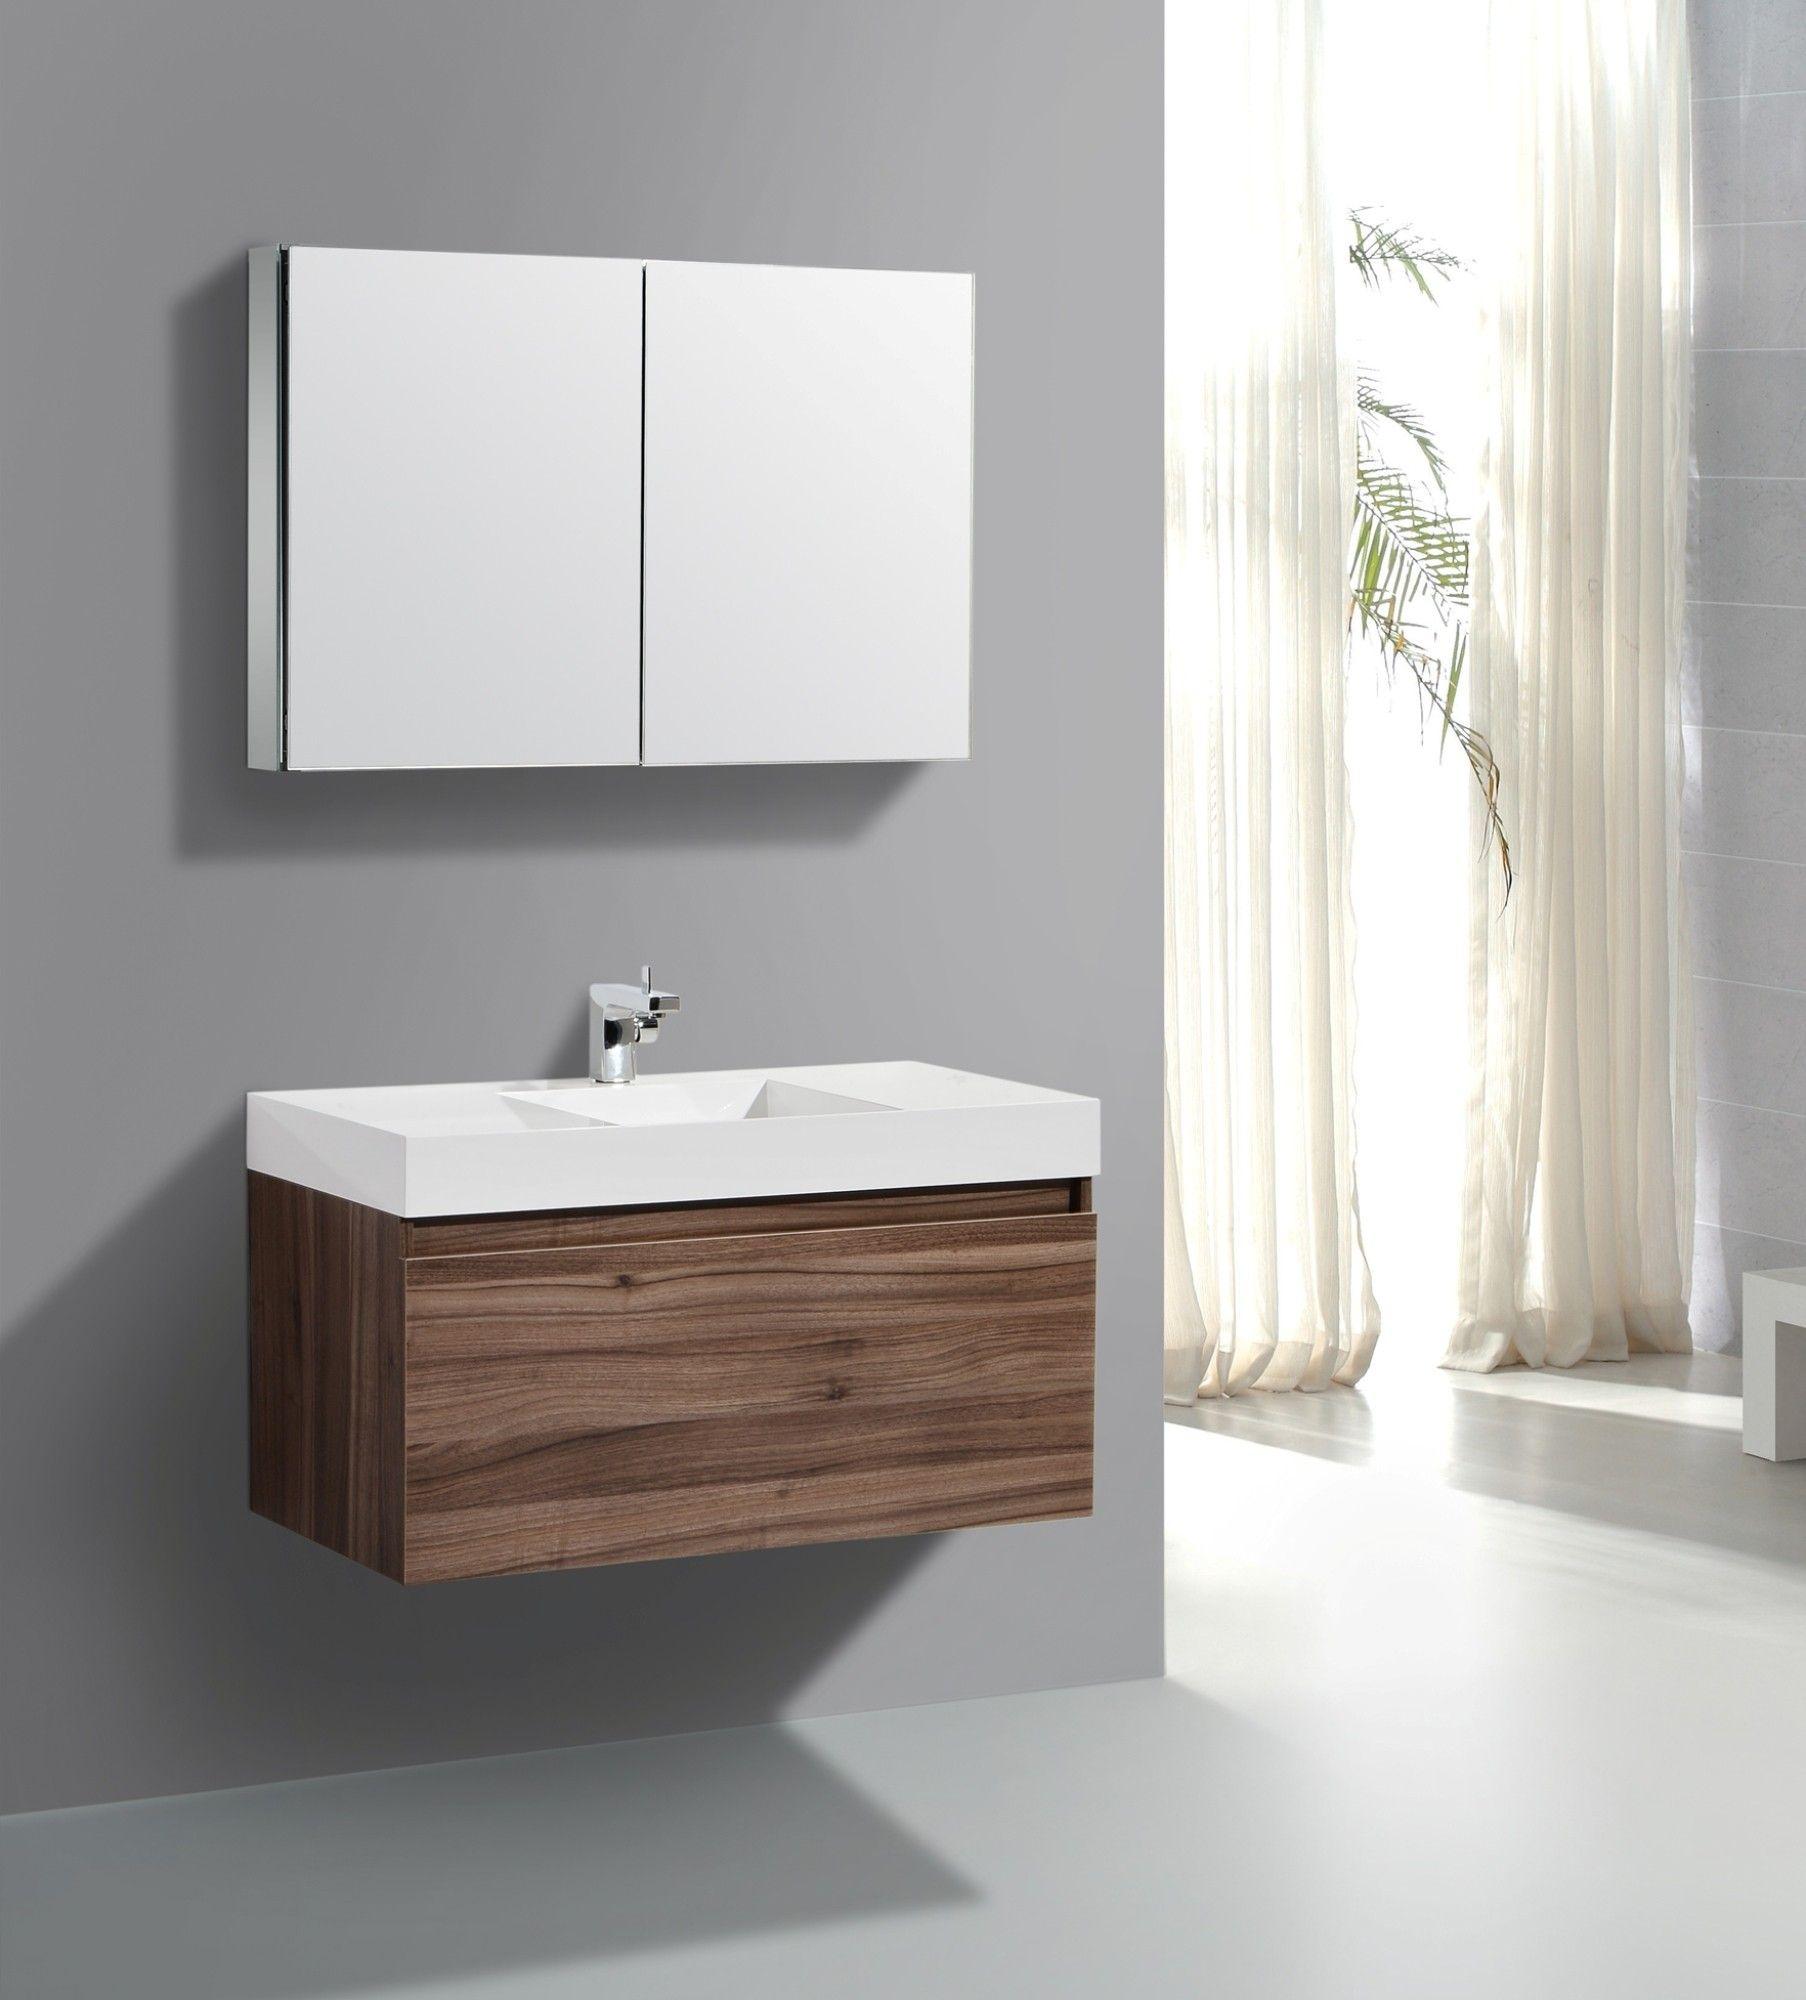 Bathroom Vanities From 36 To 40 Bath Trends Miami Fl Bathroom Vanity Remodel Luxury Bathroom Vanity Unique Bathroom Vanity